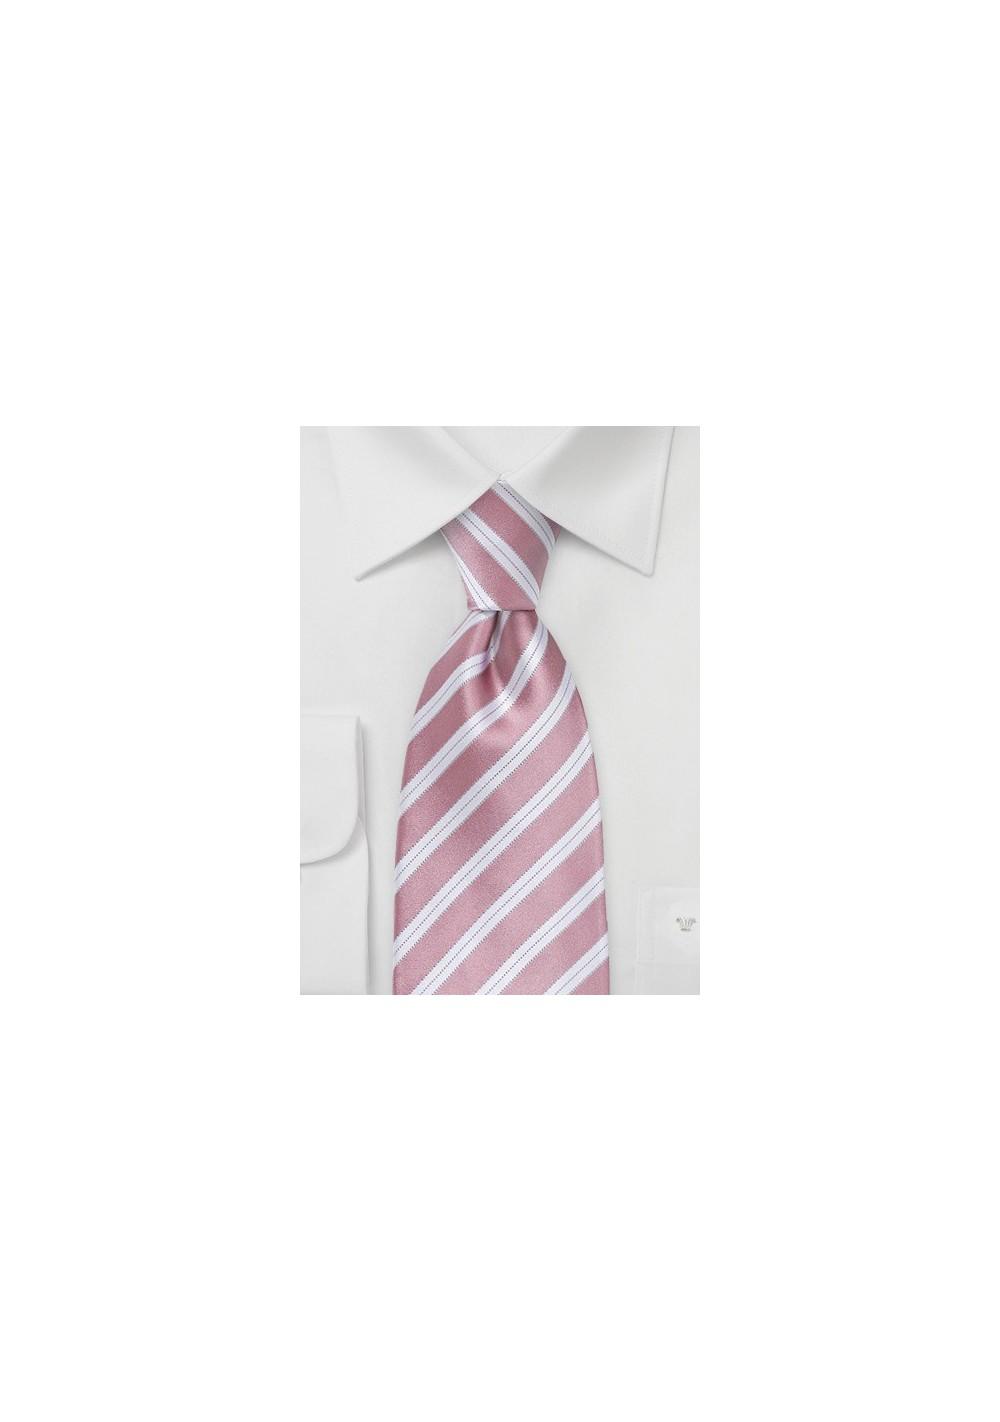 Striped XL Length Tie in Rose Petal Pink